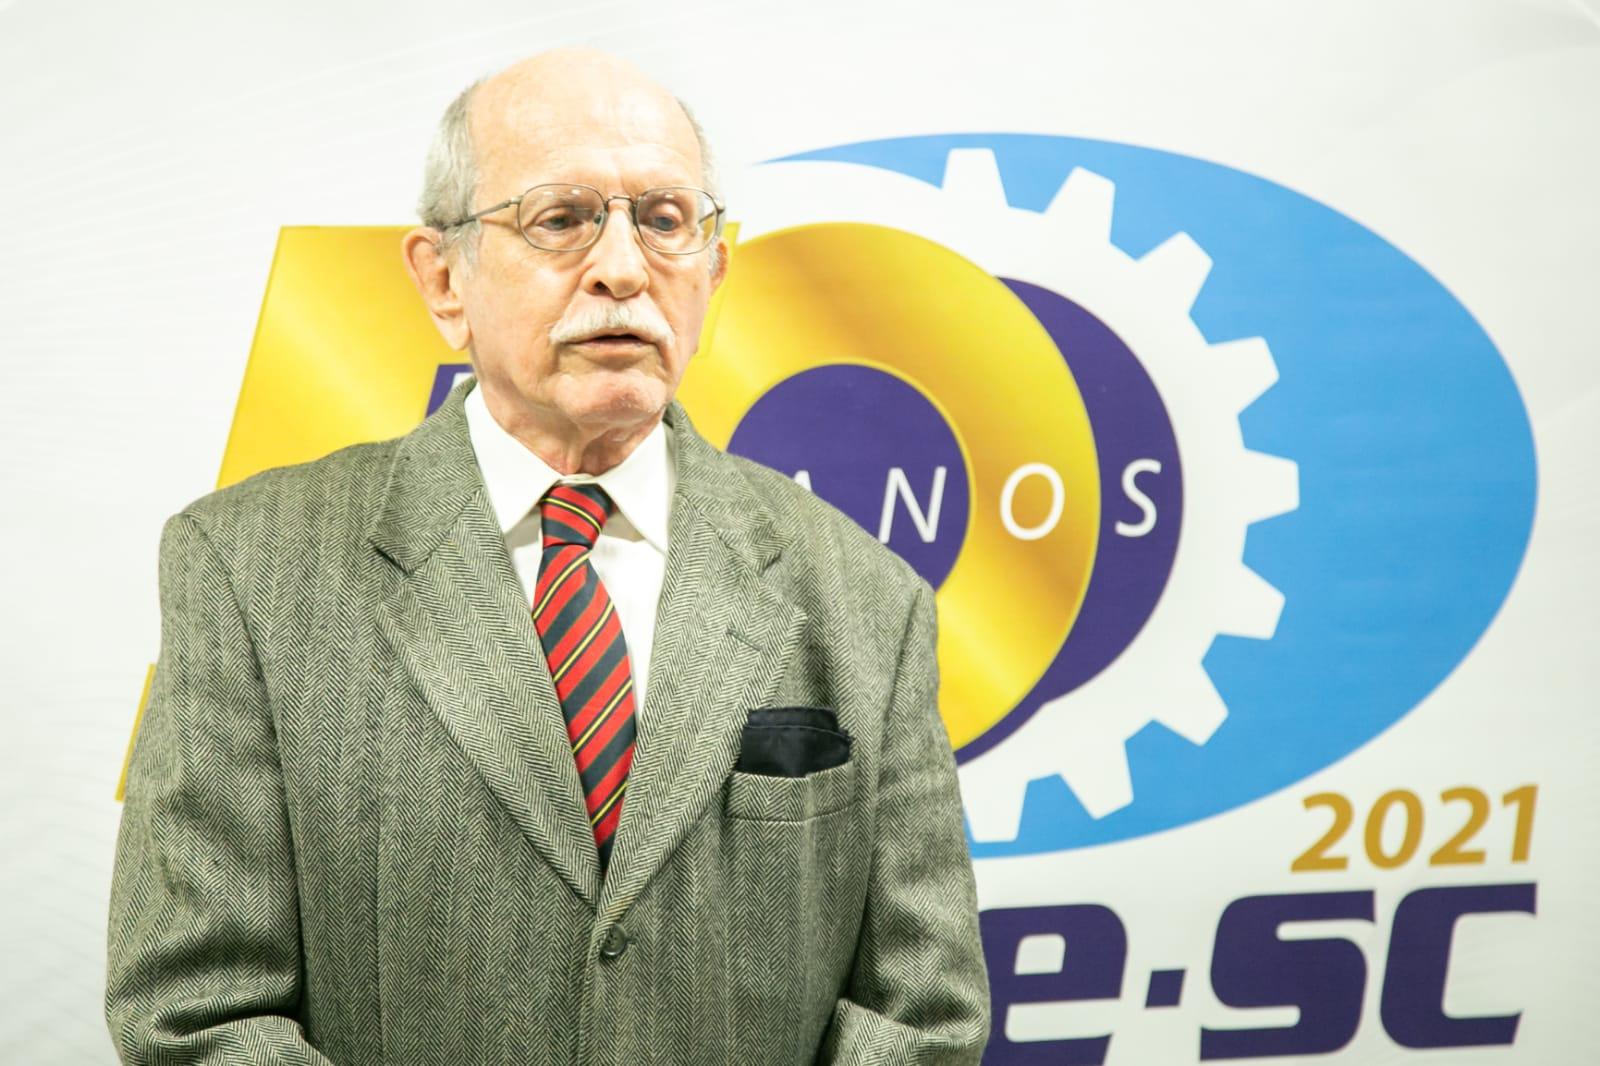 SENGE-SC E ENGENHARIA PERDEM CARLOS ALBERTO GANZO FERNANDES